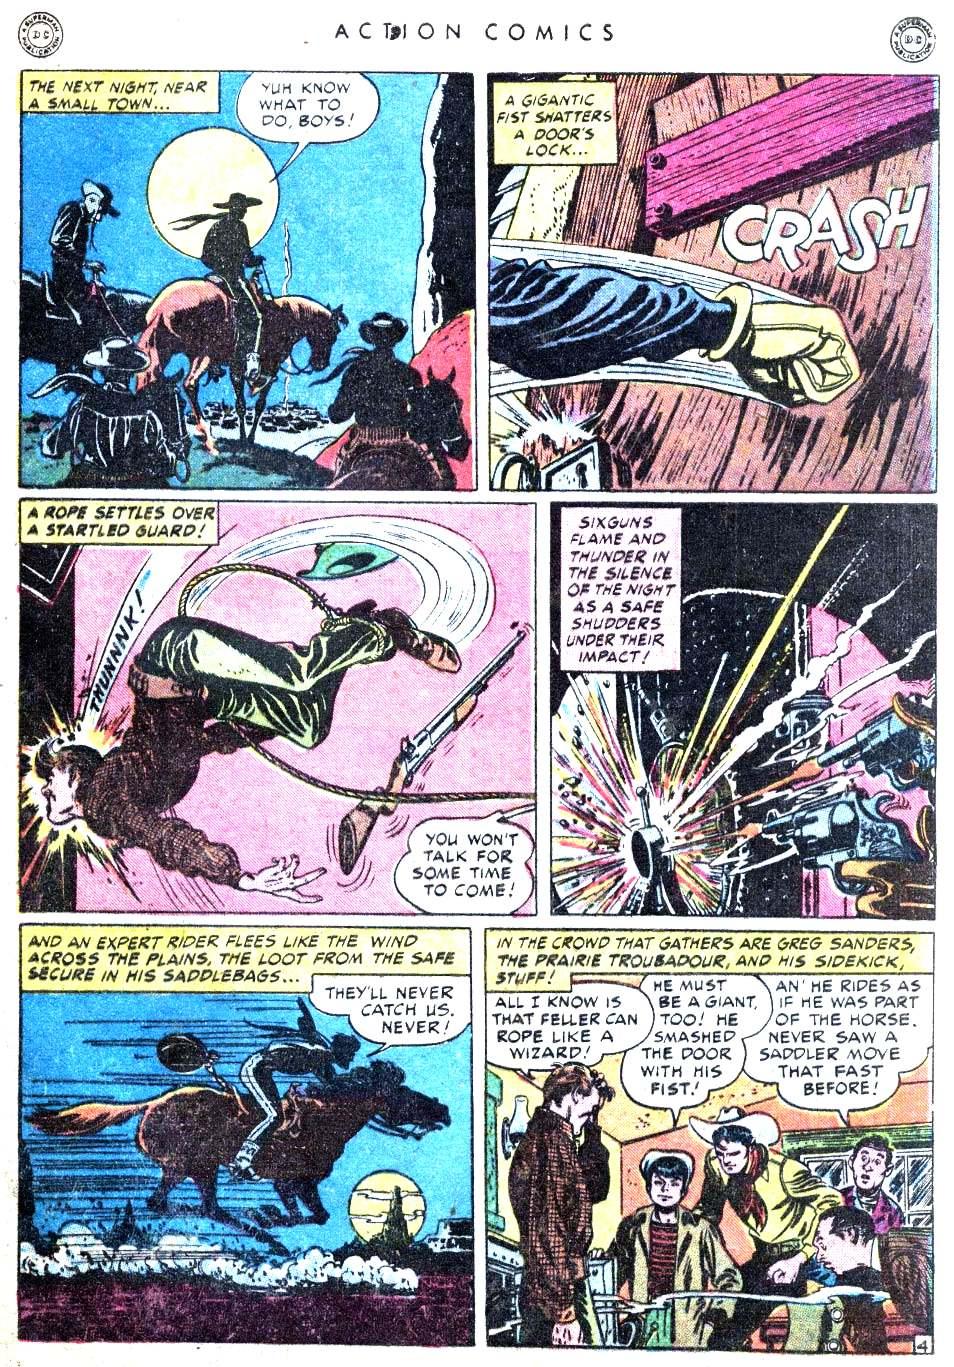 Action Comics (1938) 134 Page 42